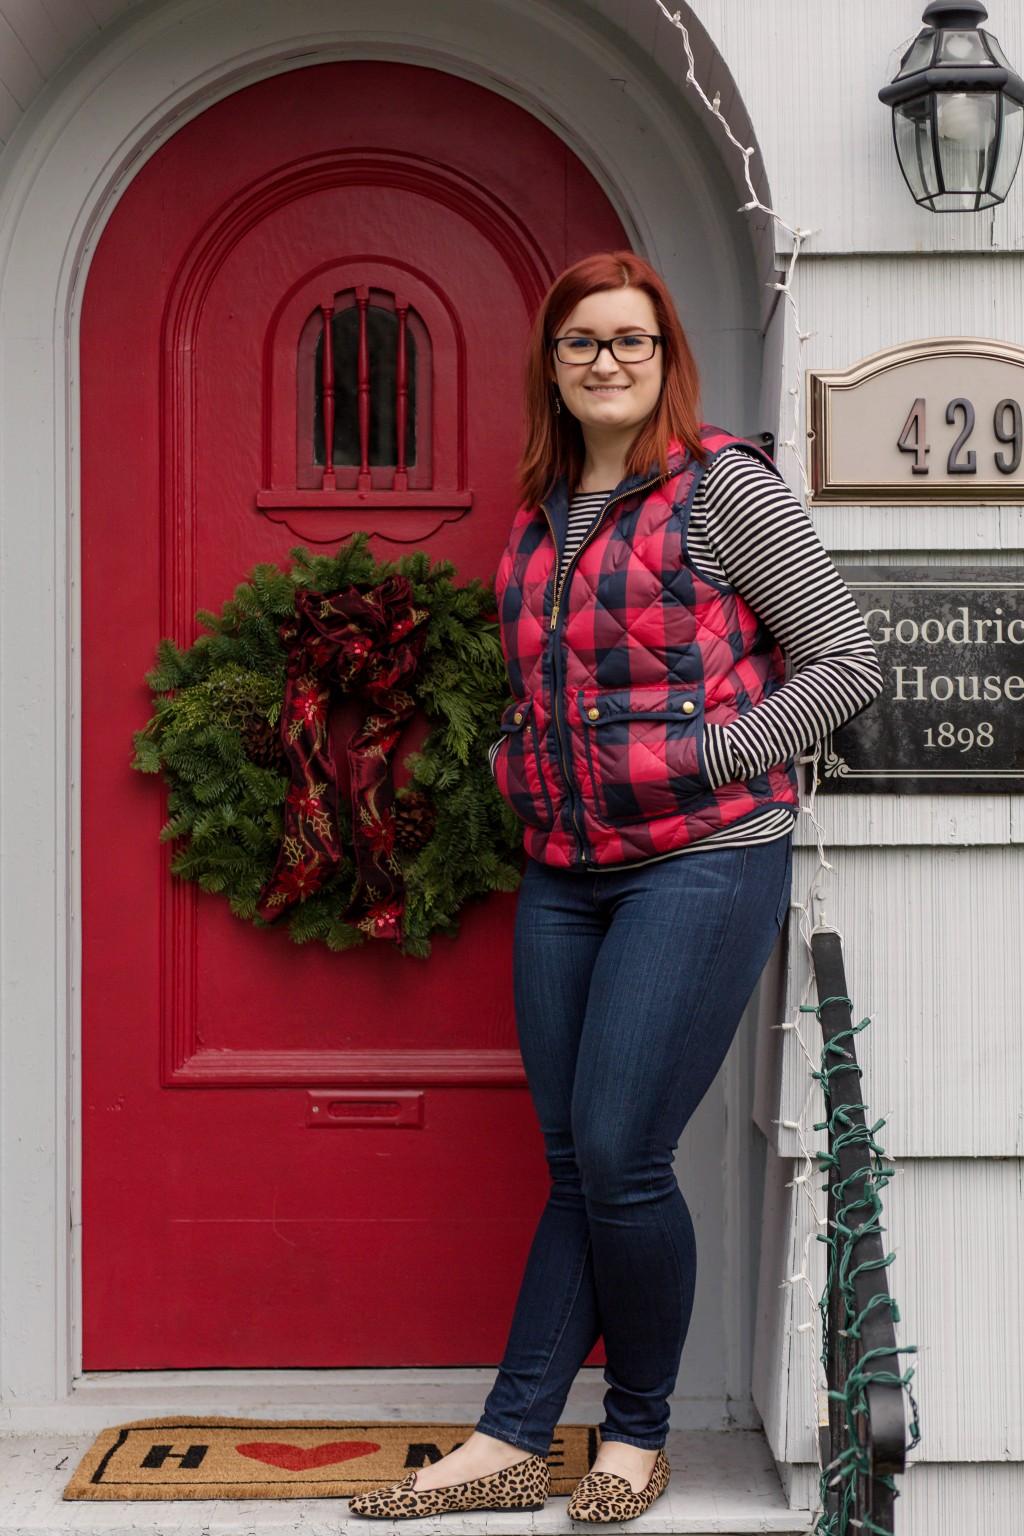 1 - All Things Kate in Paige Denim, Shoes of Prety, J.Crew, Kam Dhillon Glasses, Kendra Scott via Rocksbox